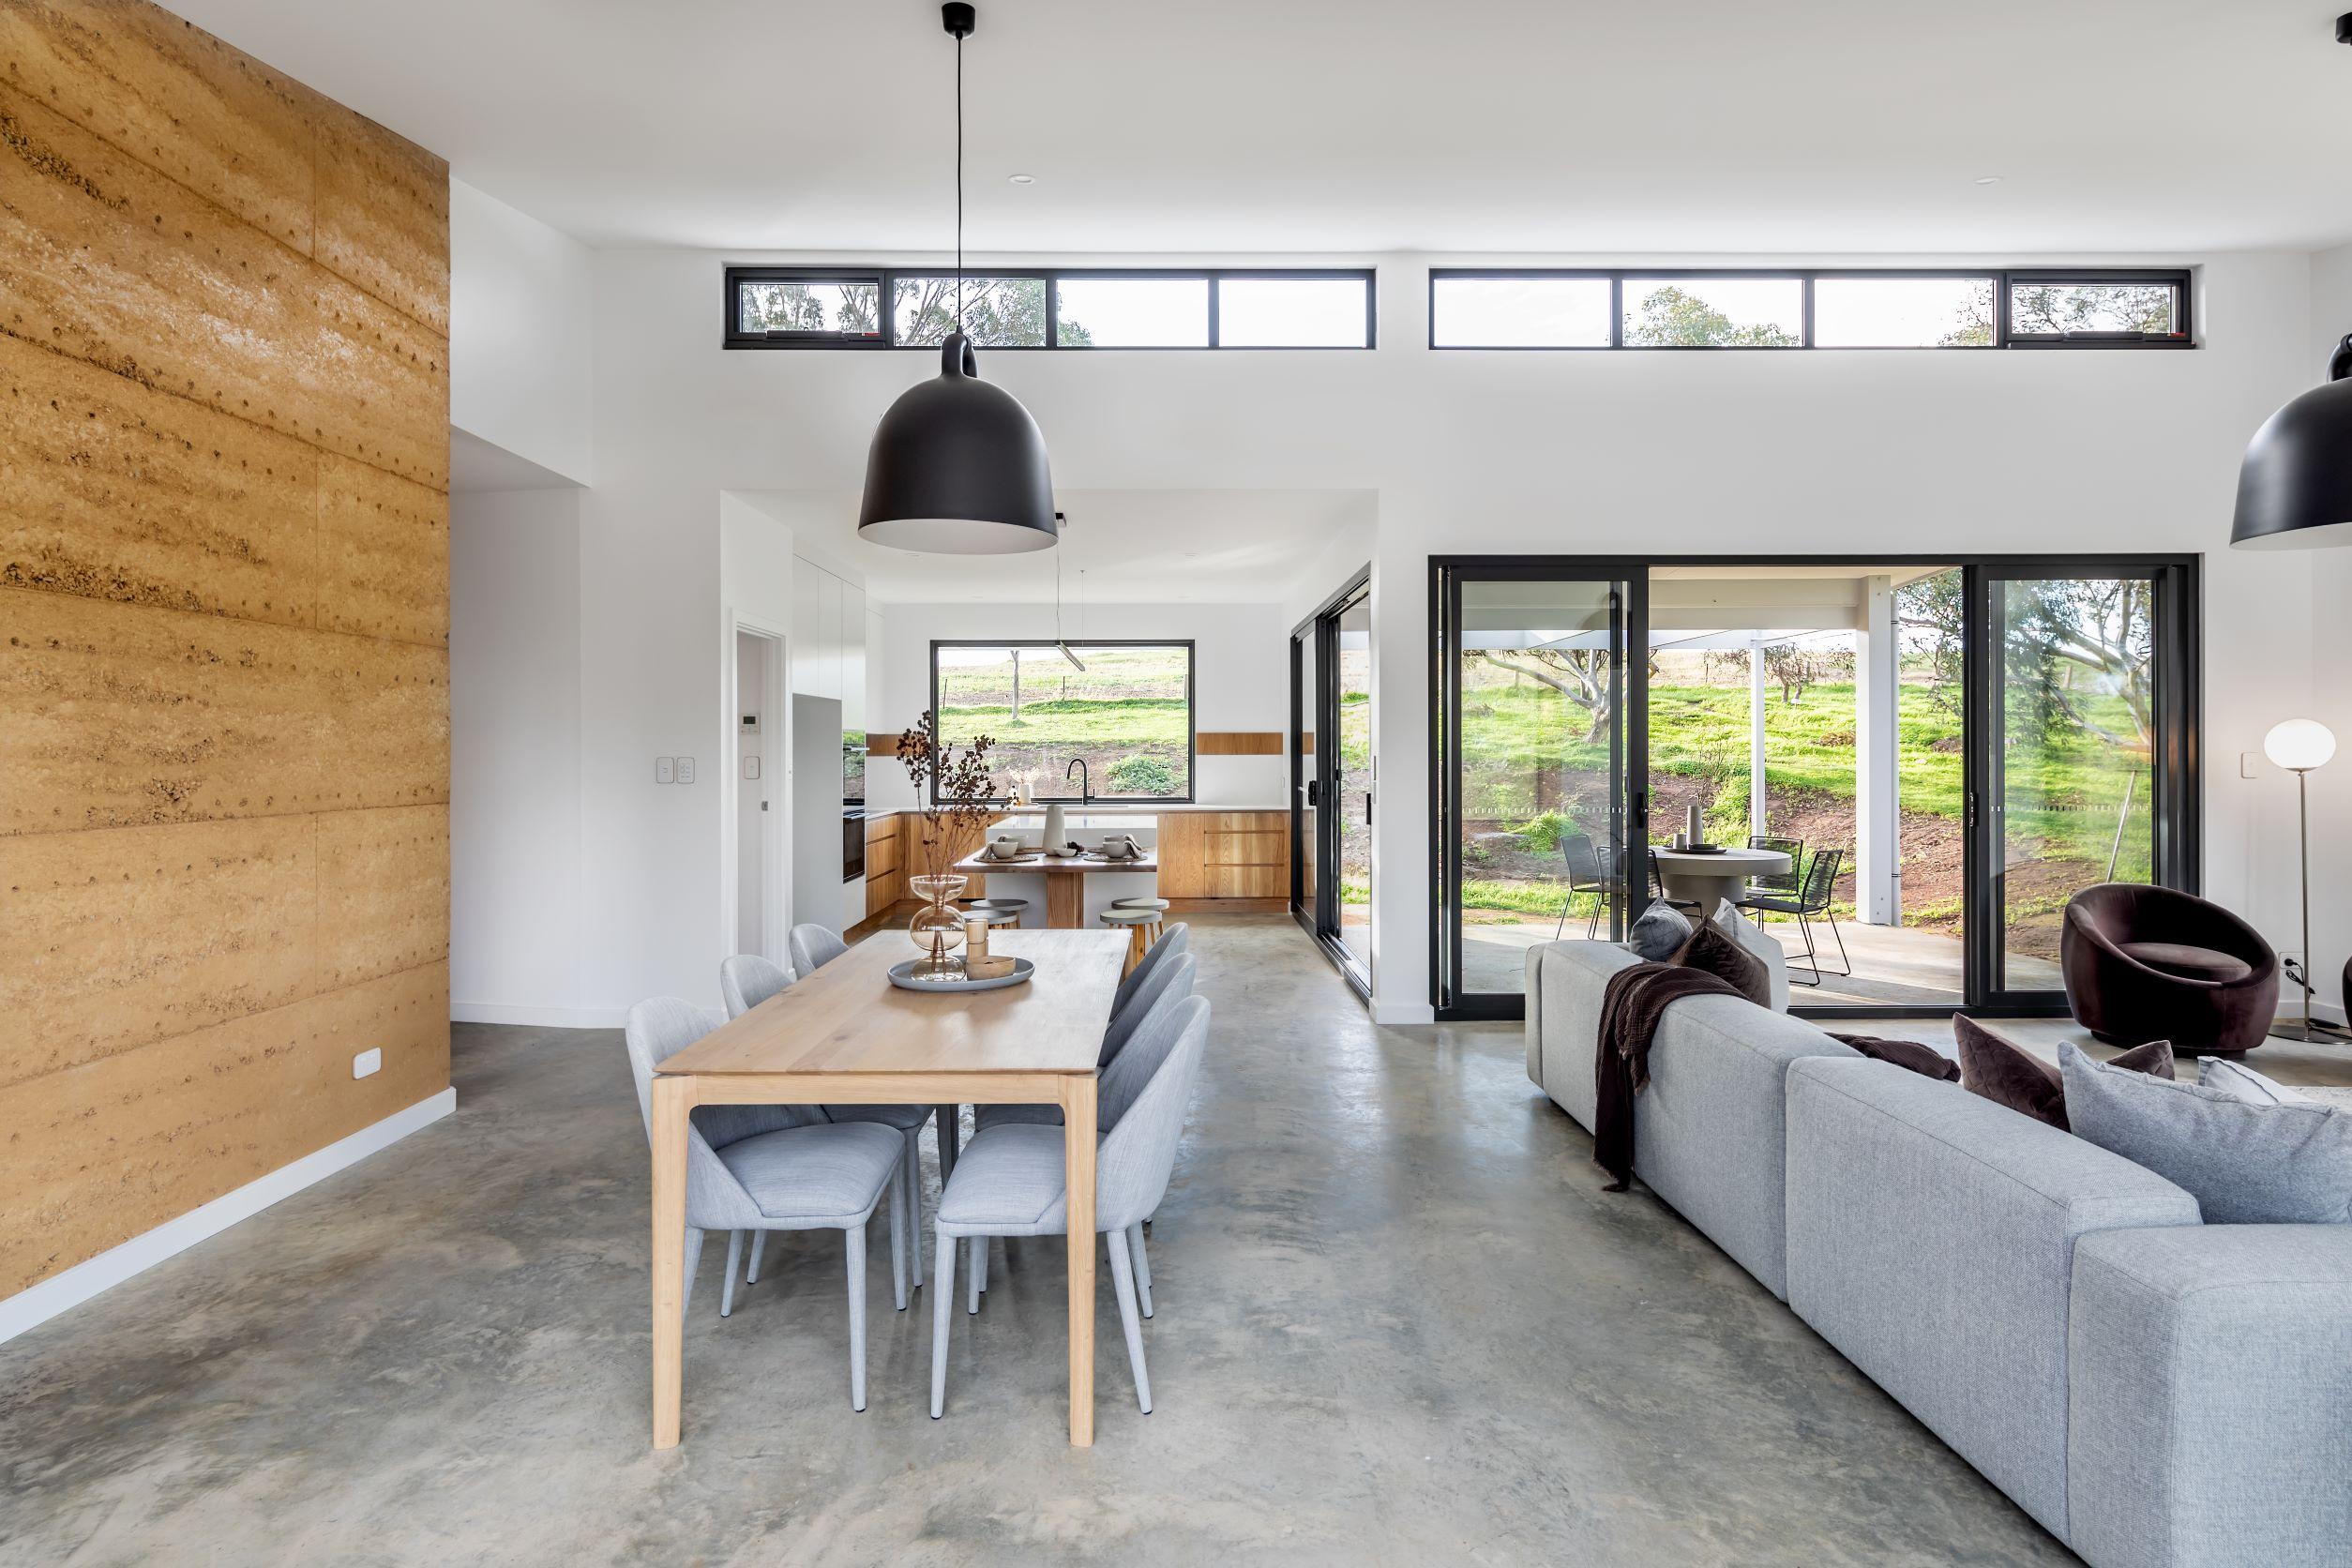 aaron-martin-constructions-dawson-street-project-open-plan-living